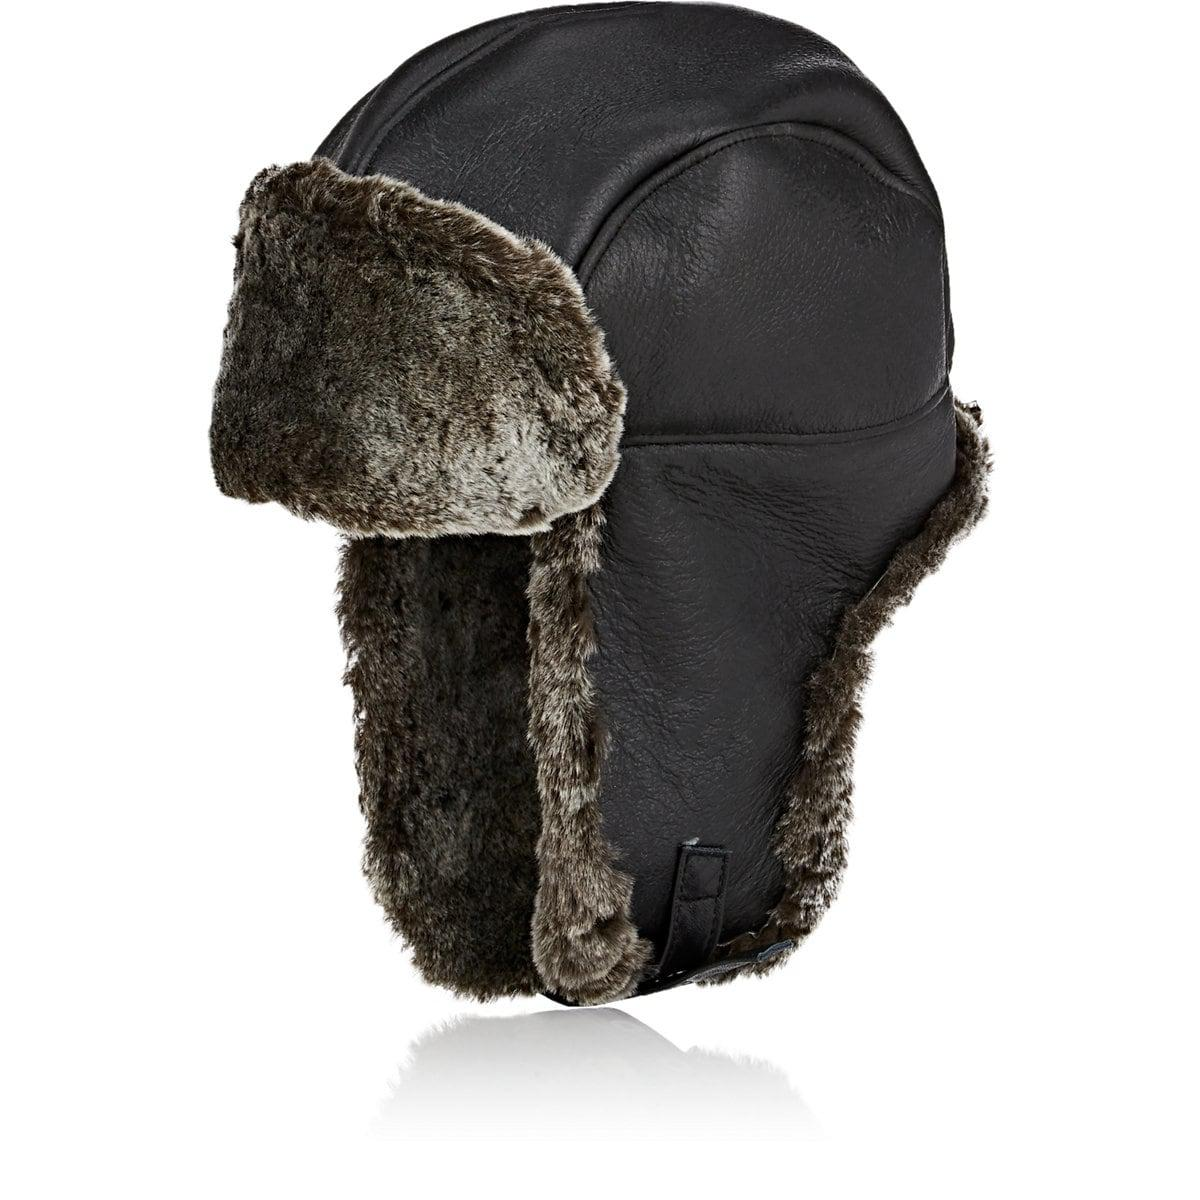 a8410d079e0e7 Crown Cap Shearling Aviator Hat in Black for Men - Lyst